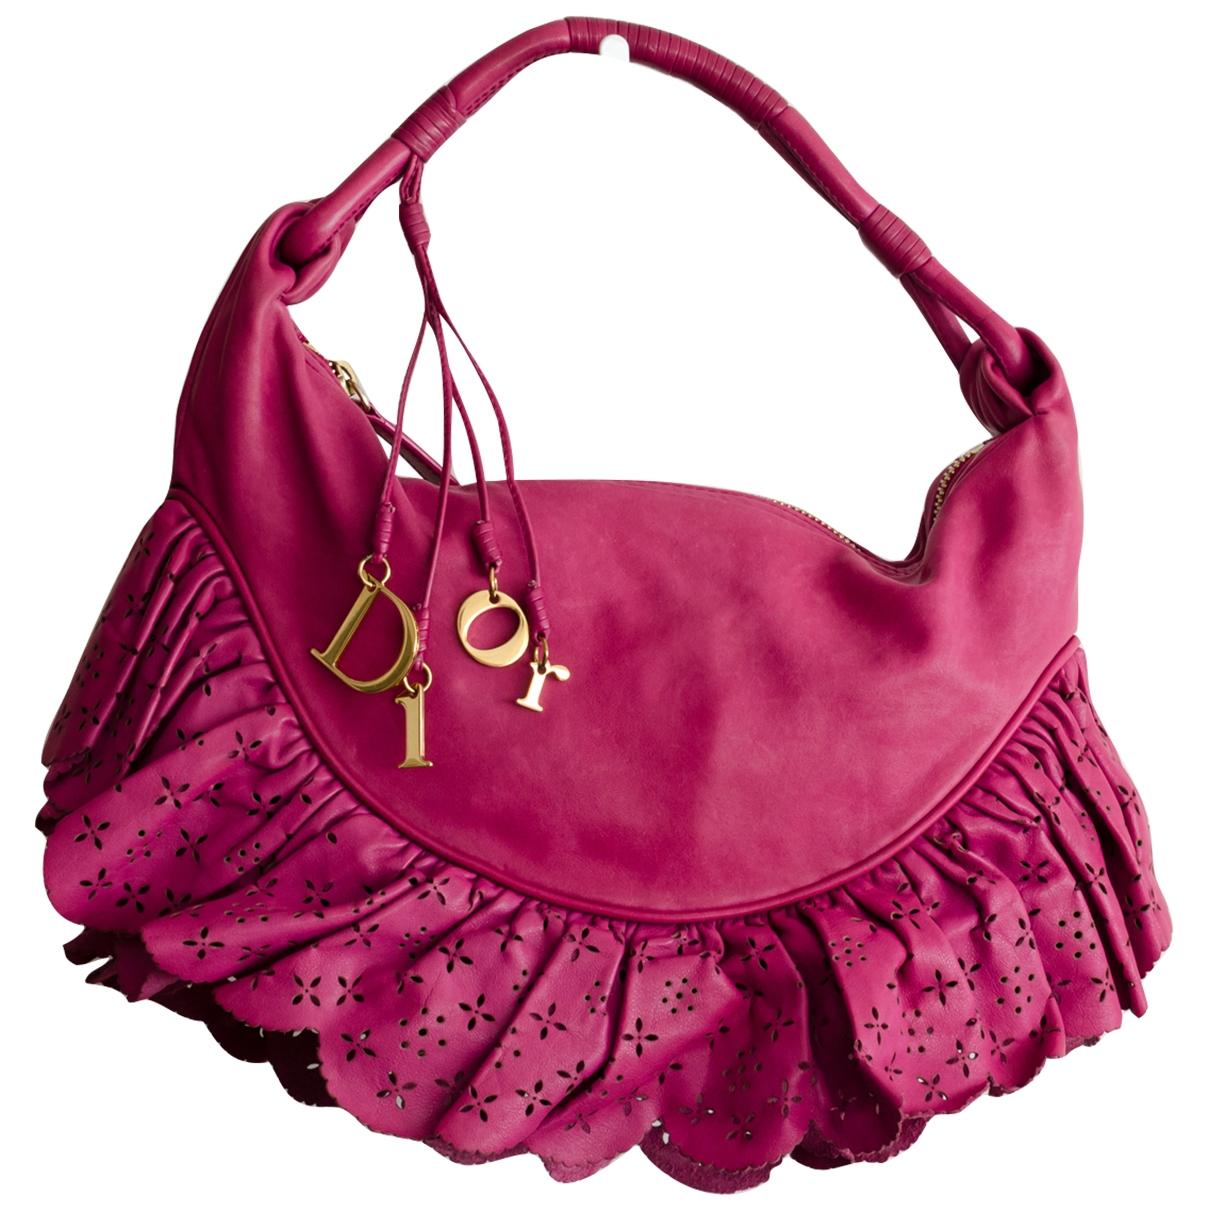 Dior \N Pink Leather handbag for Women \N